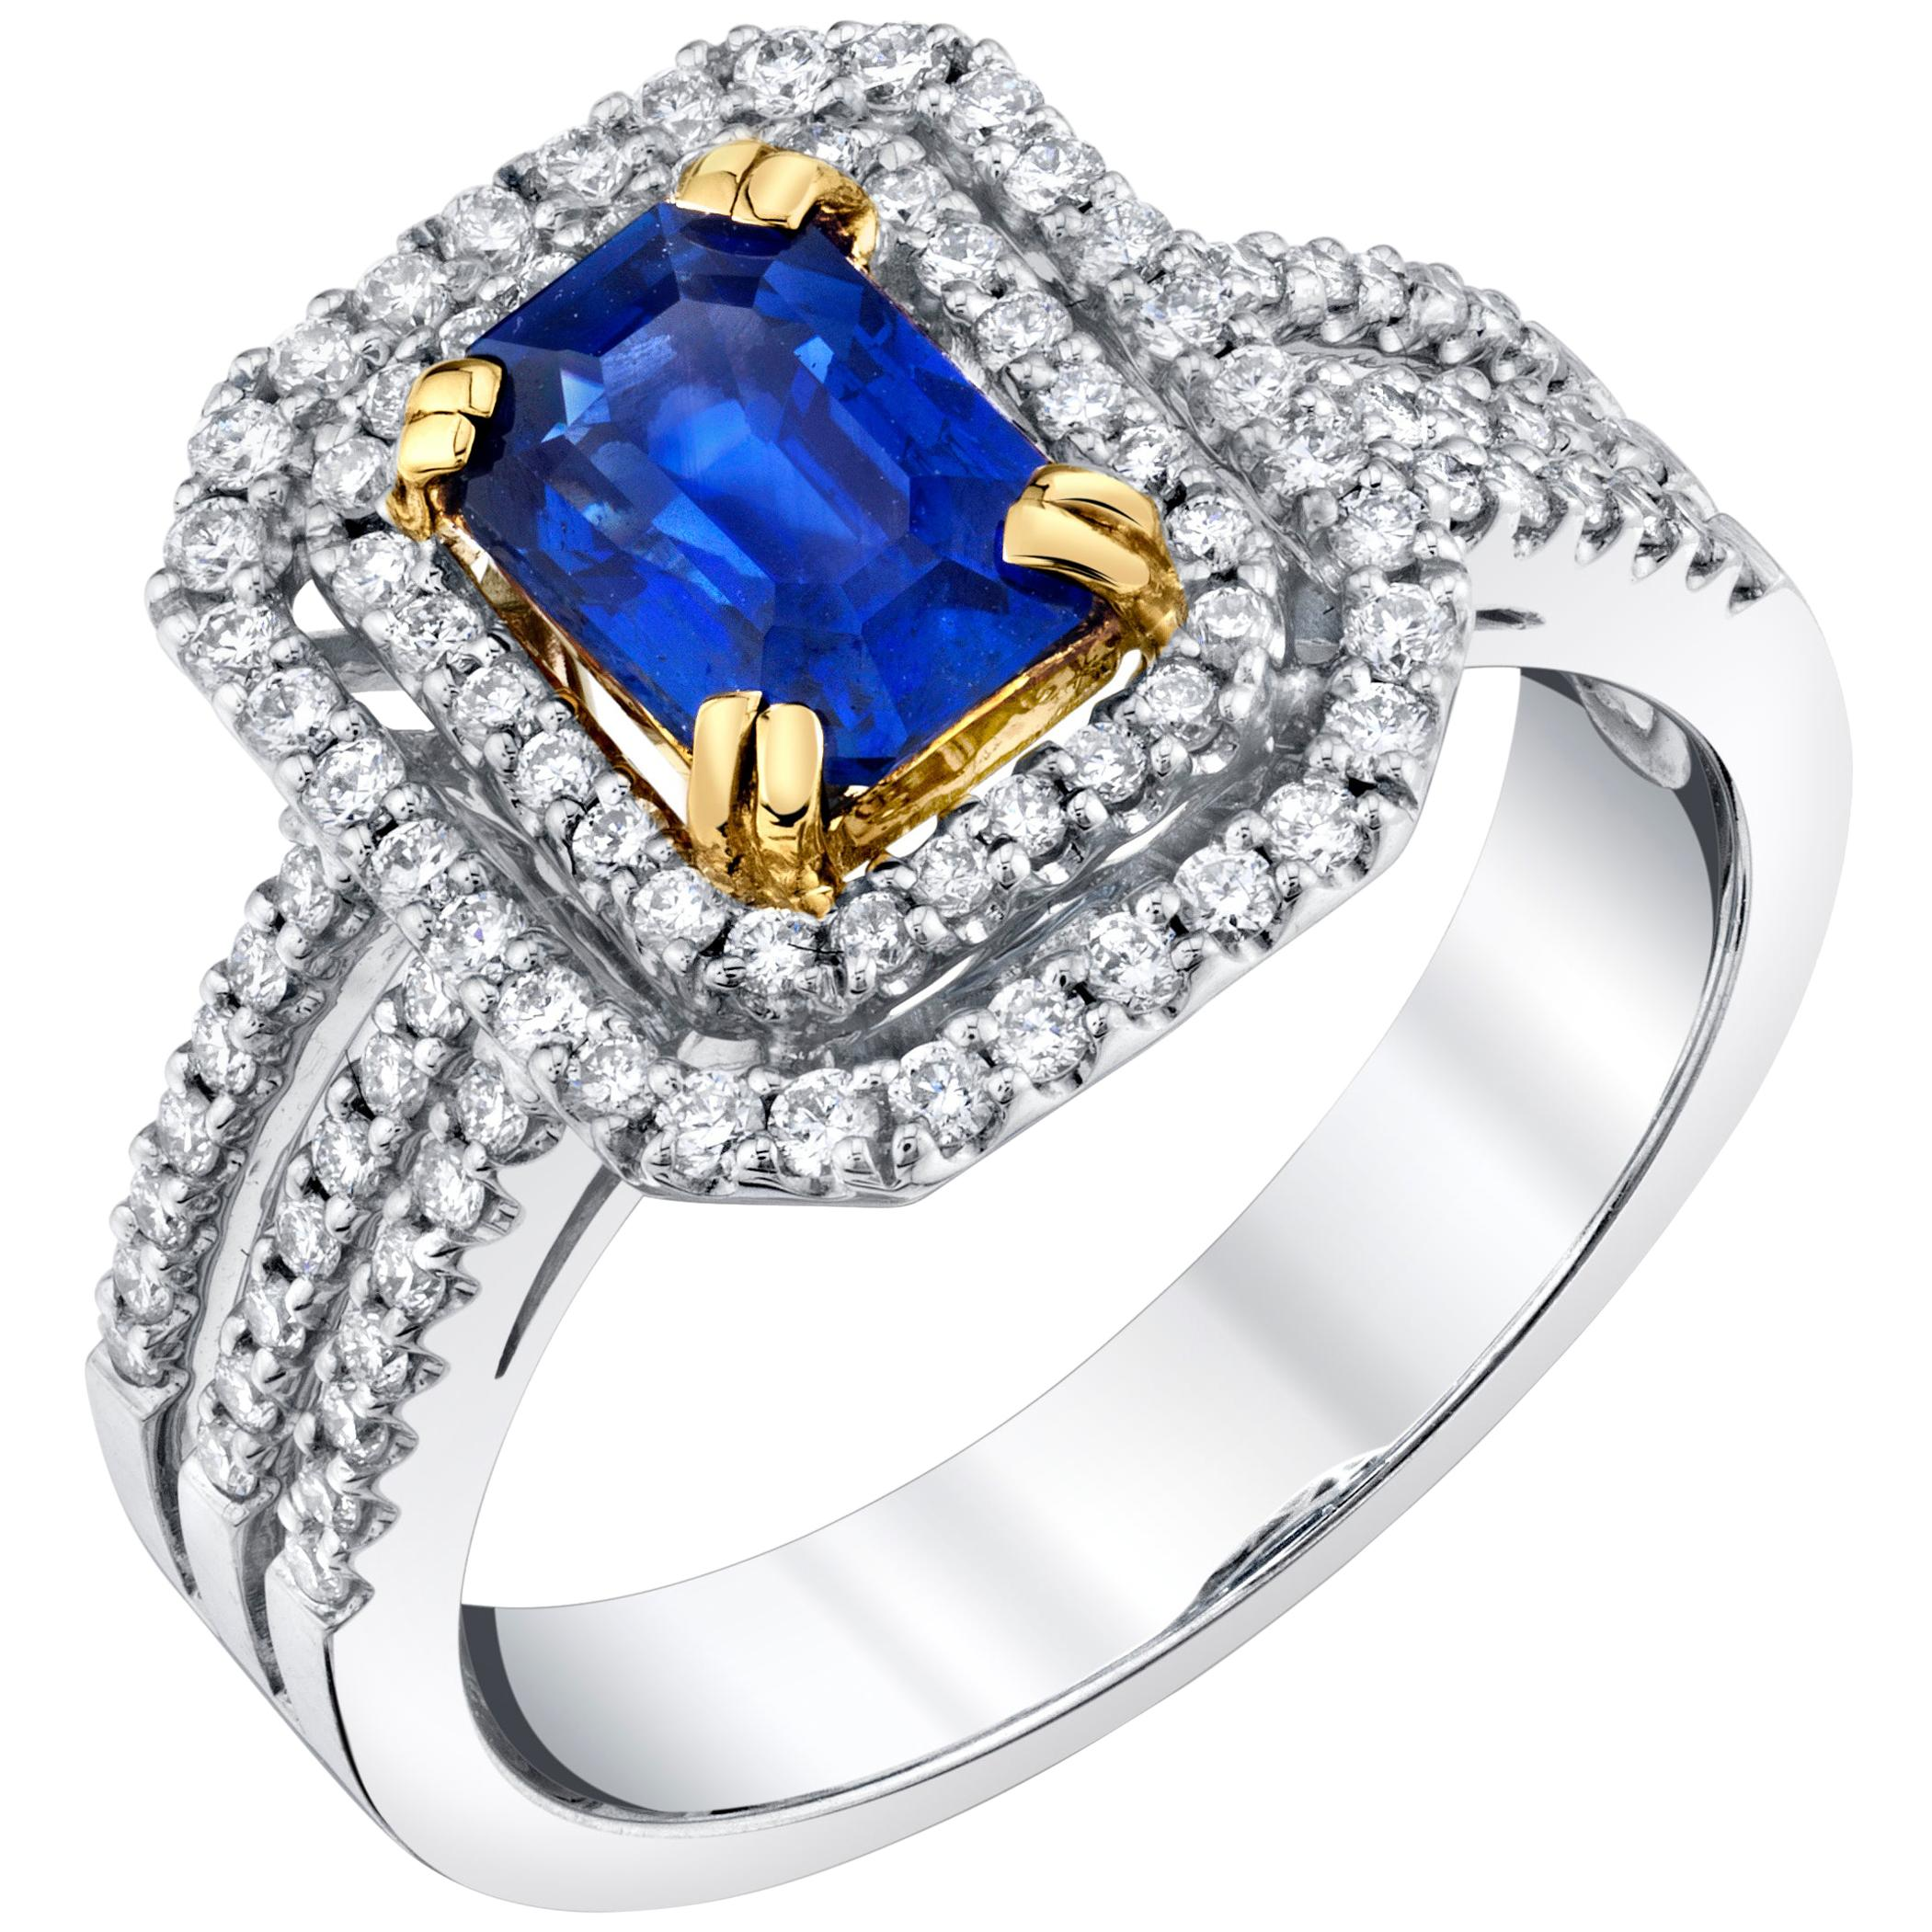 1.25 ct. Blue Sapphire, Diamond Halo 18k White Yellow Gold Engagement Band Ring